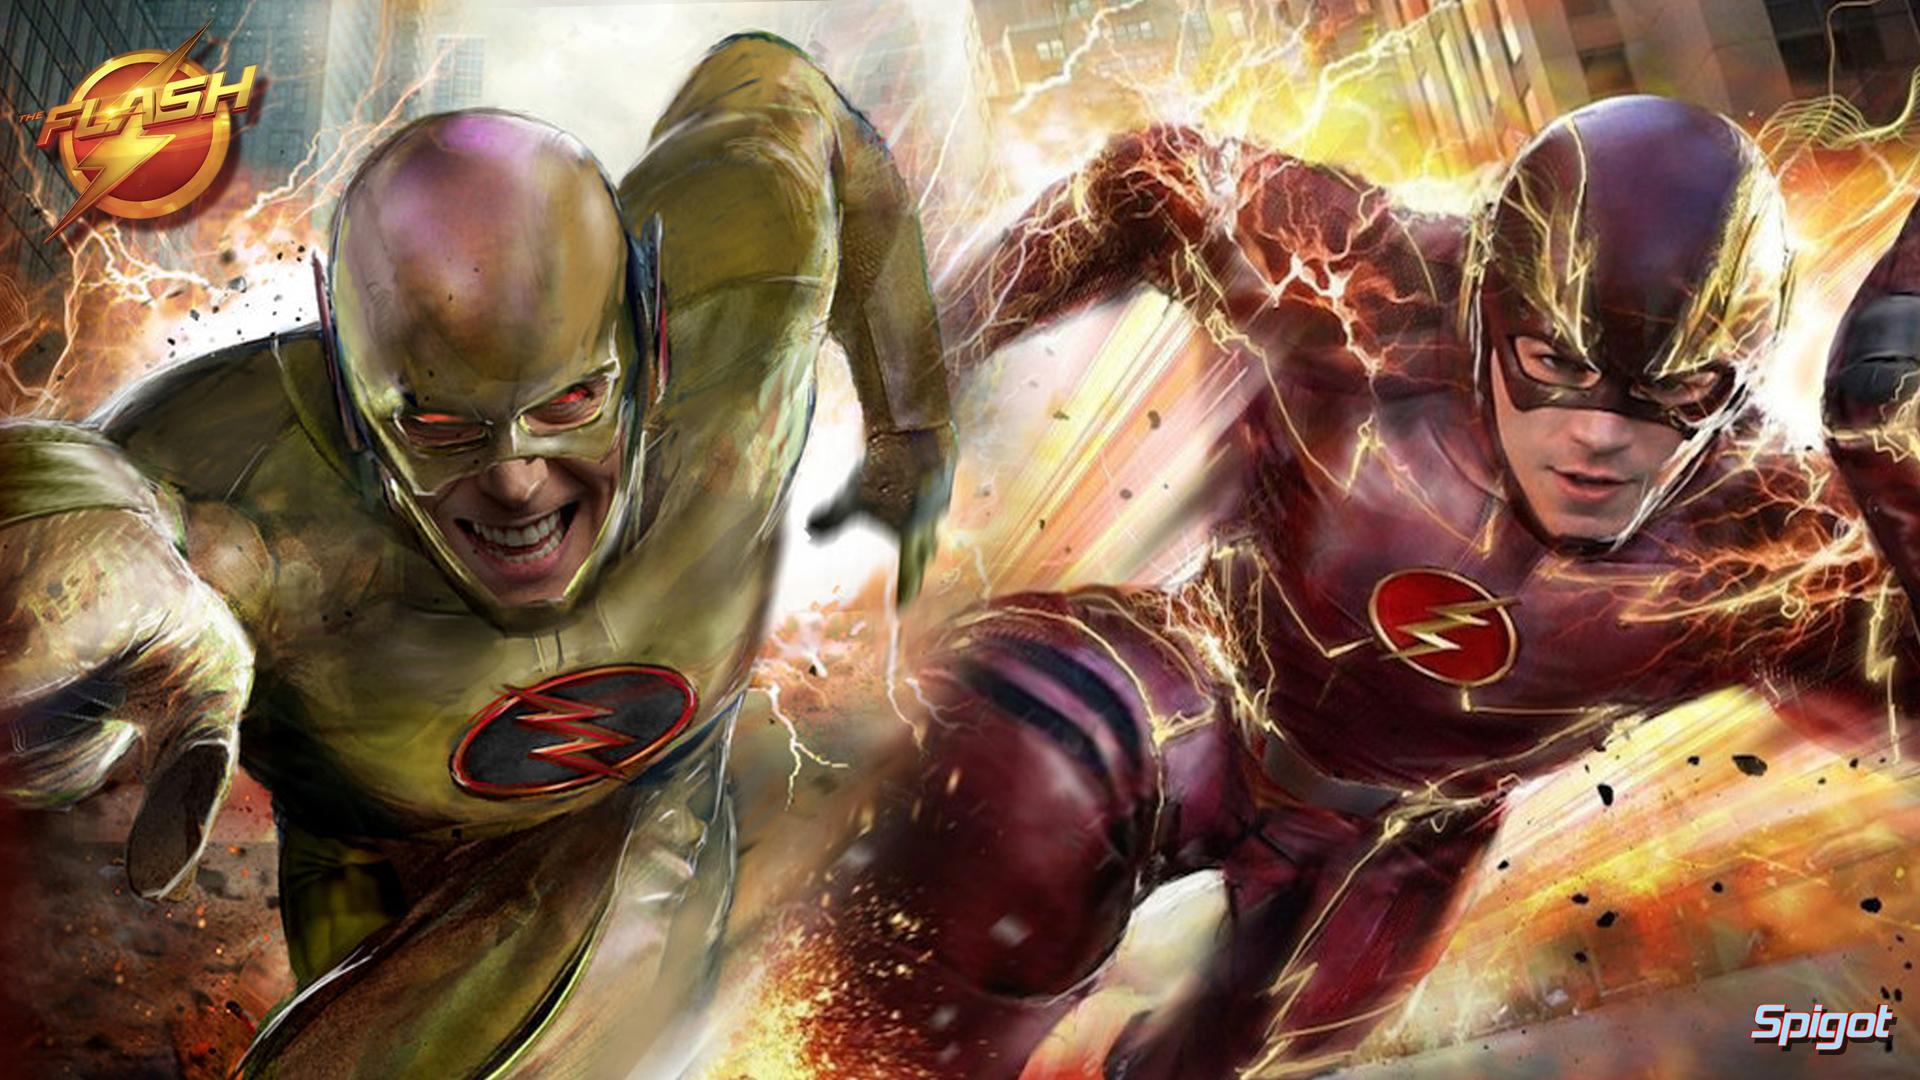 Flash Vs Reverse Flash Wallpaper: George Spigot's Blog